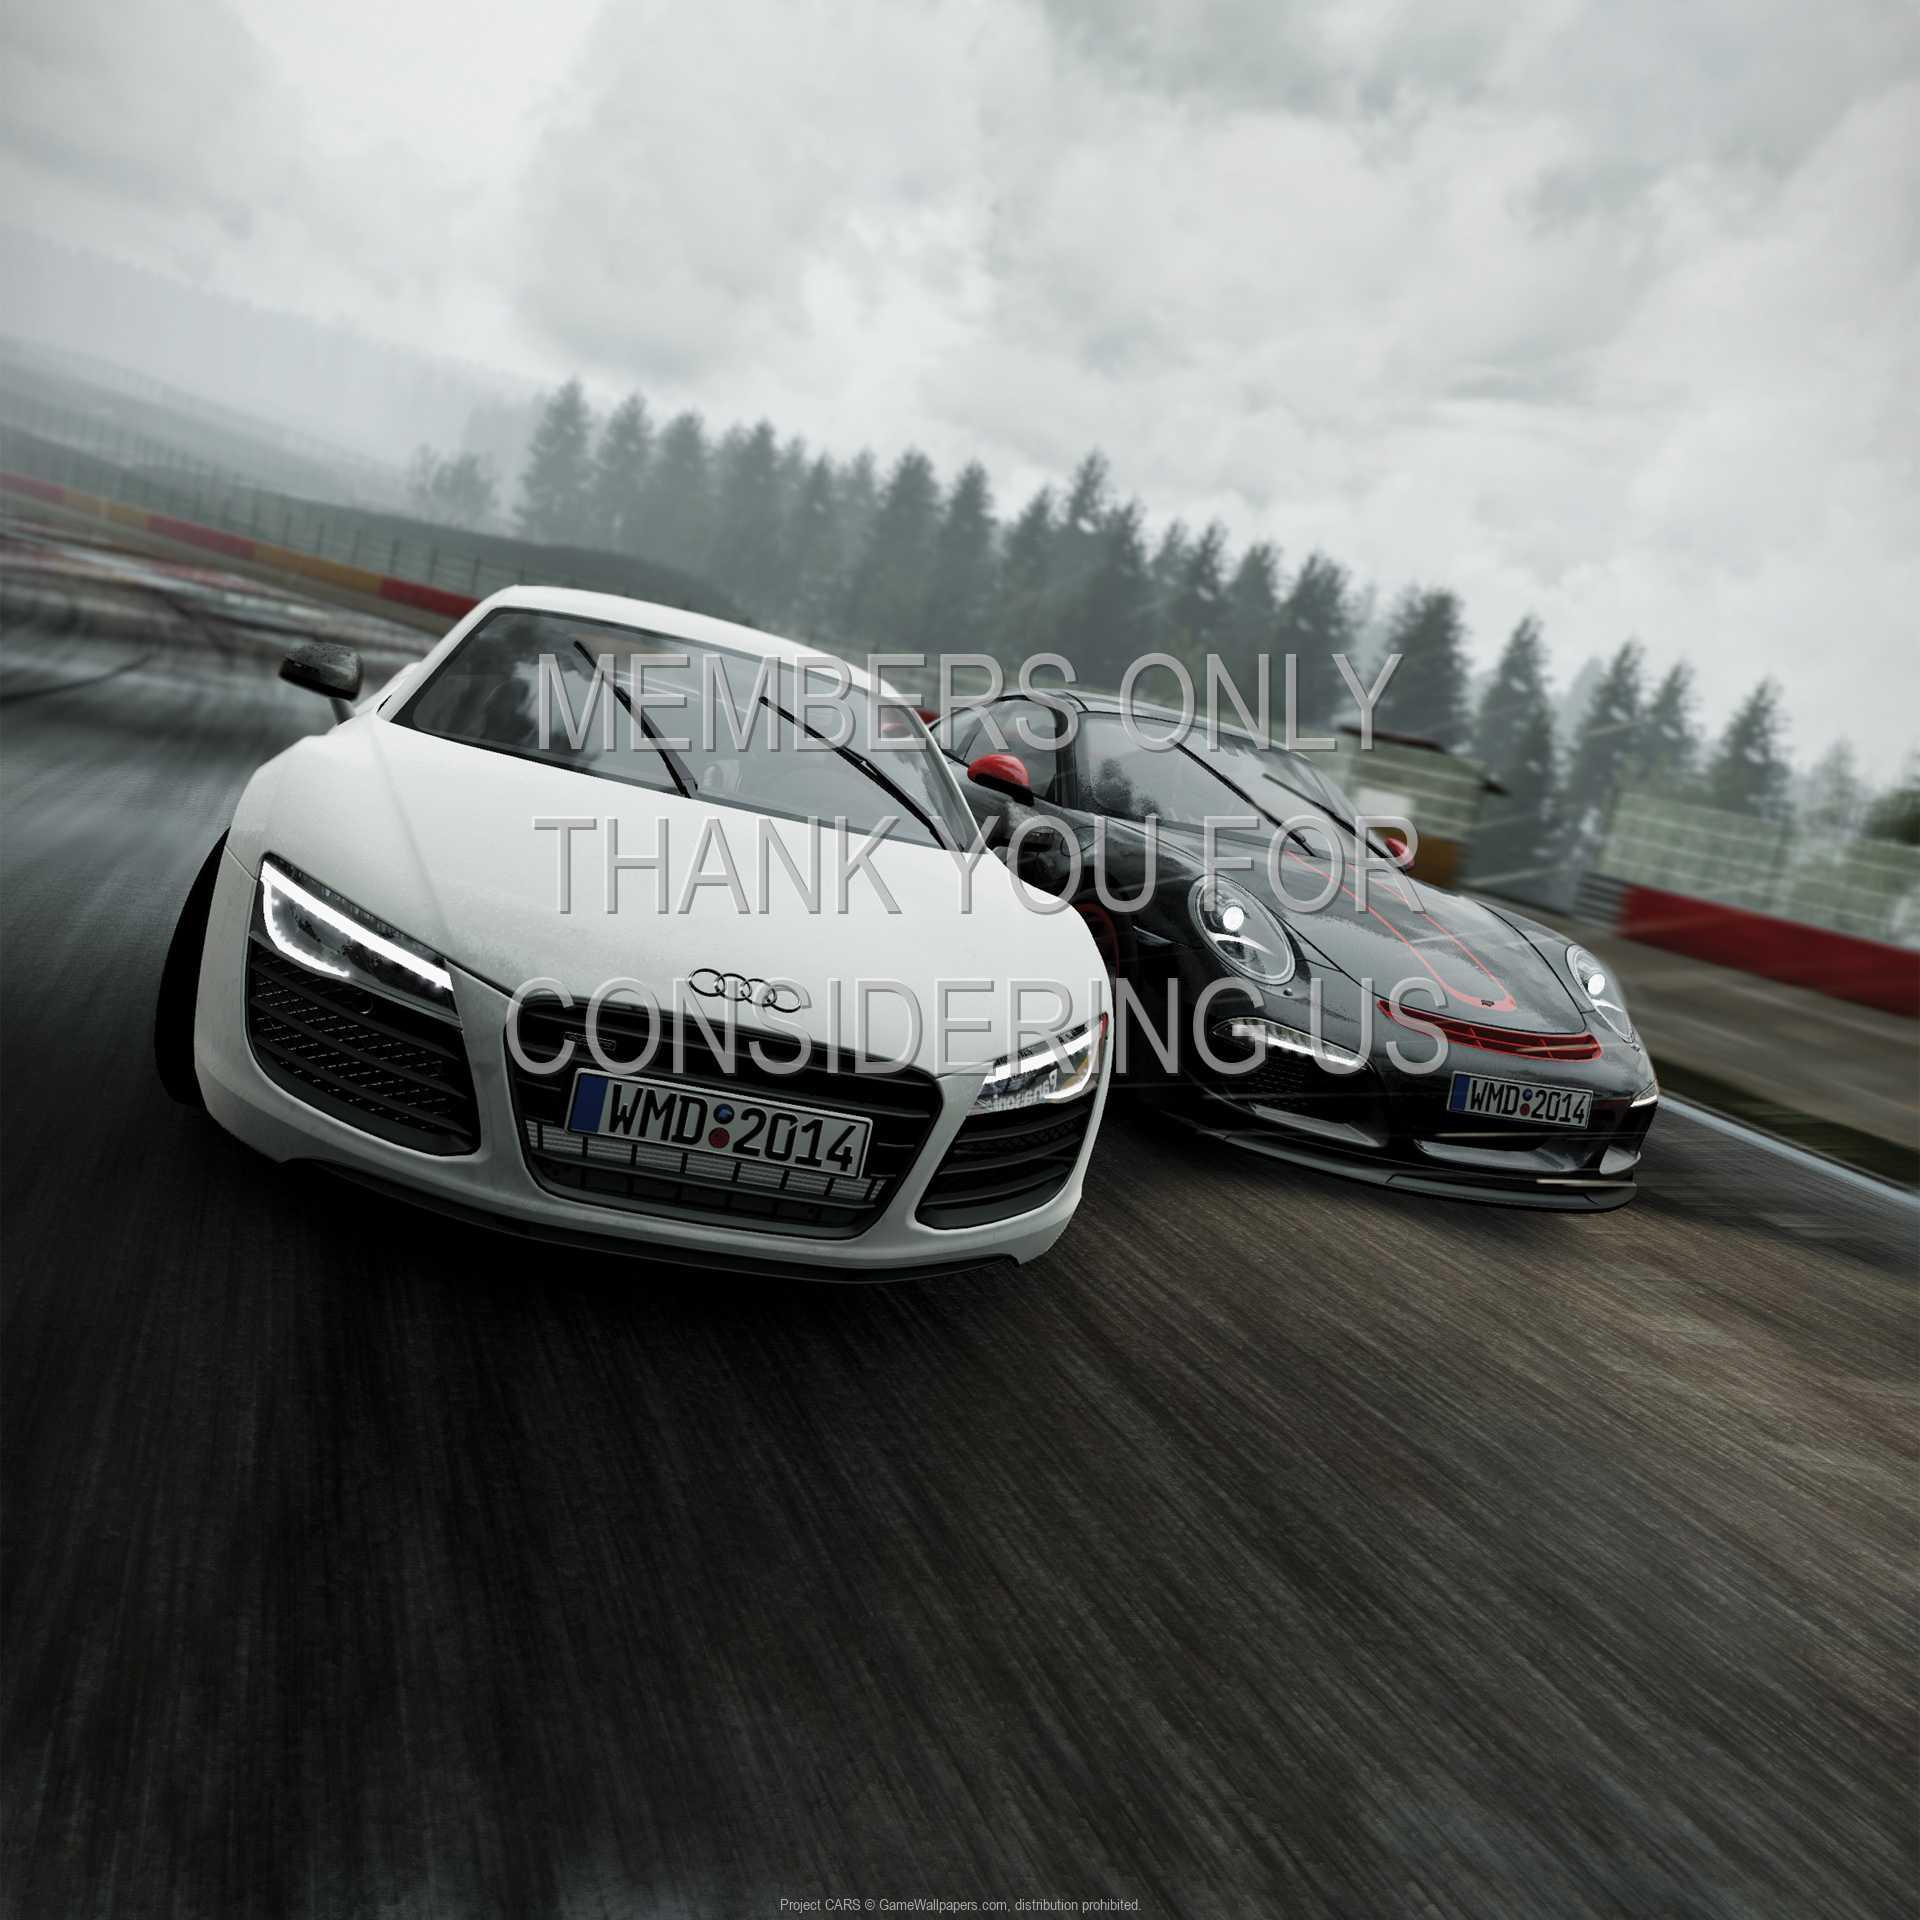 Project CARS 1080p Horizontal Handy Hintergrundbild 01